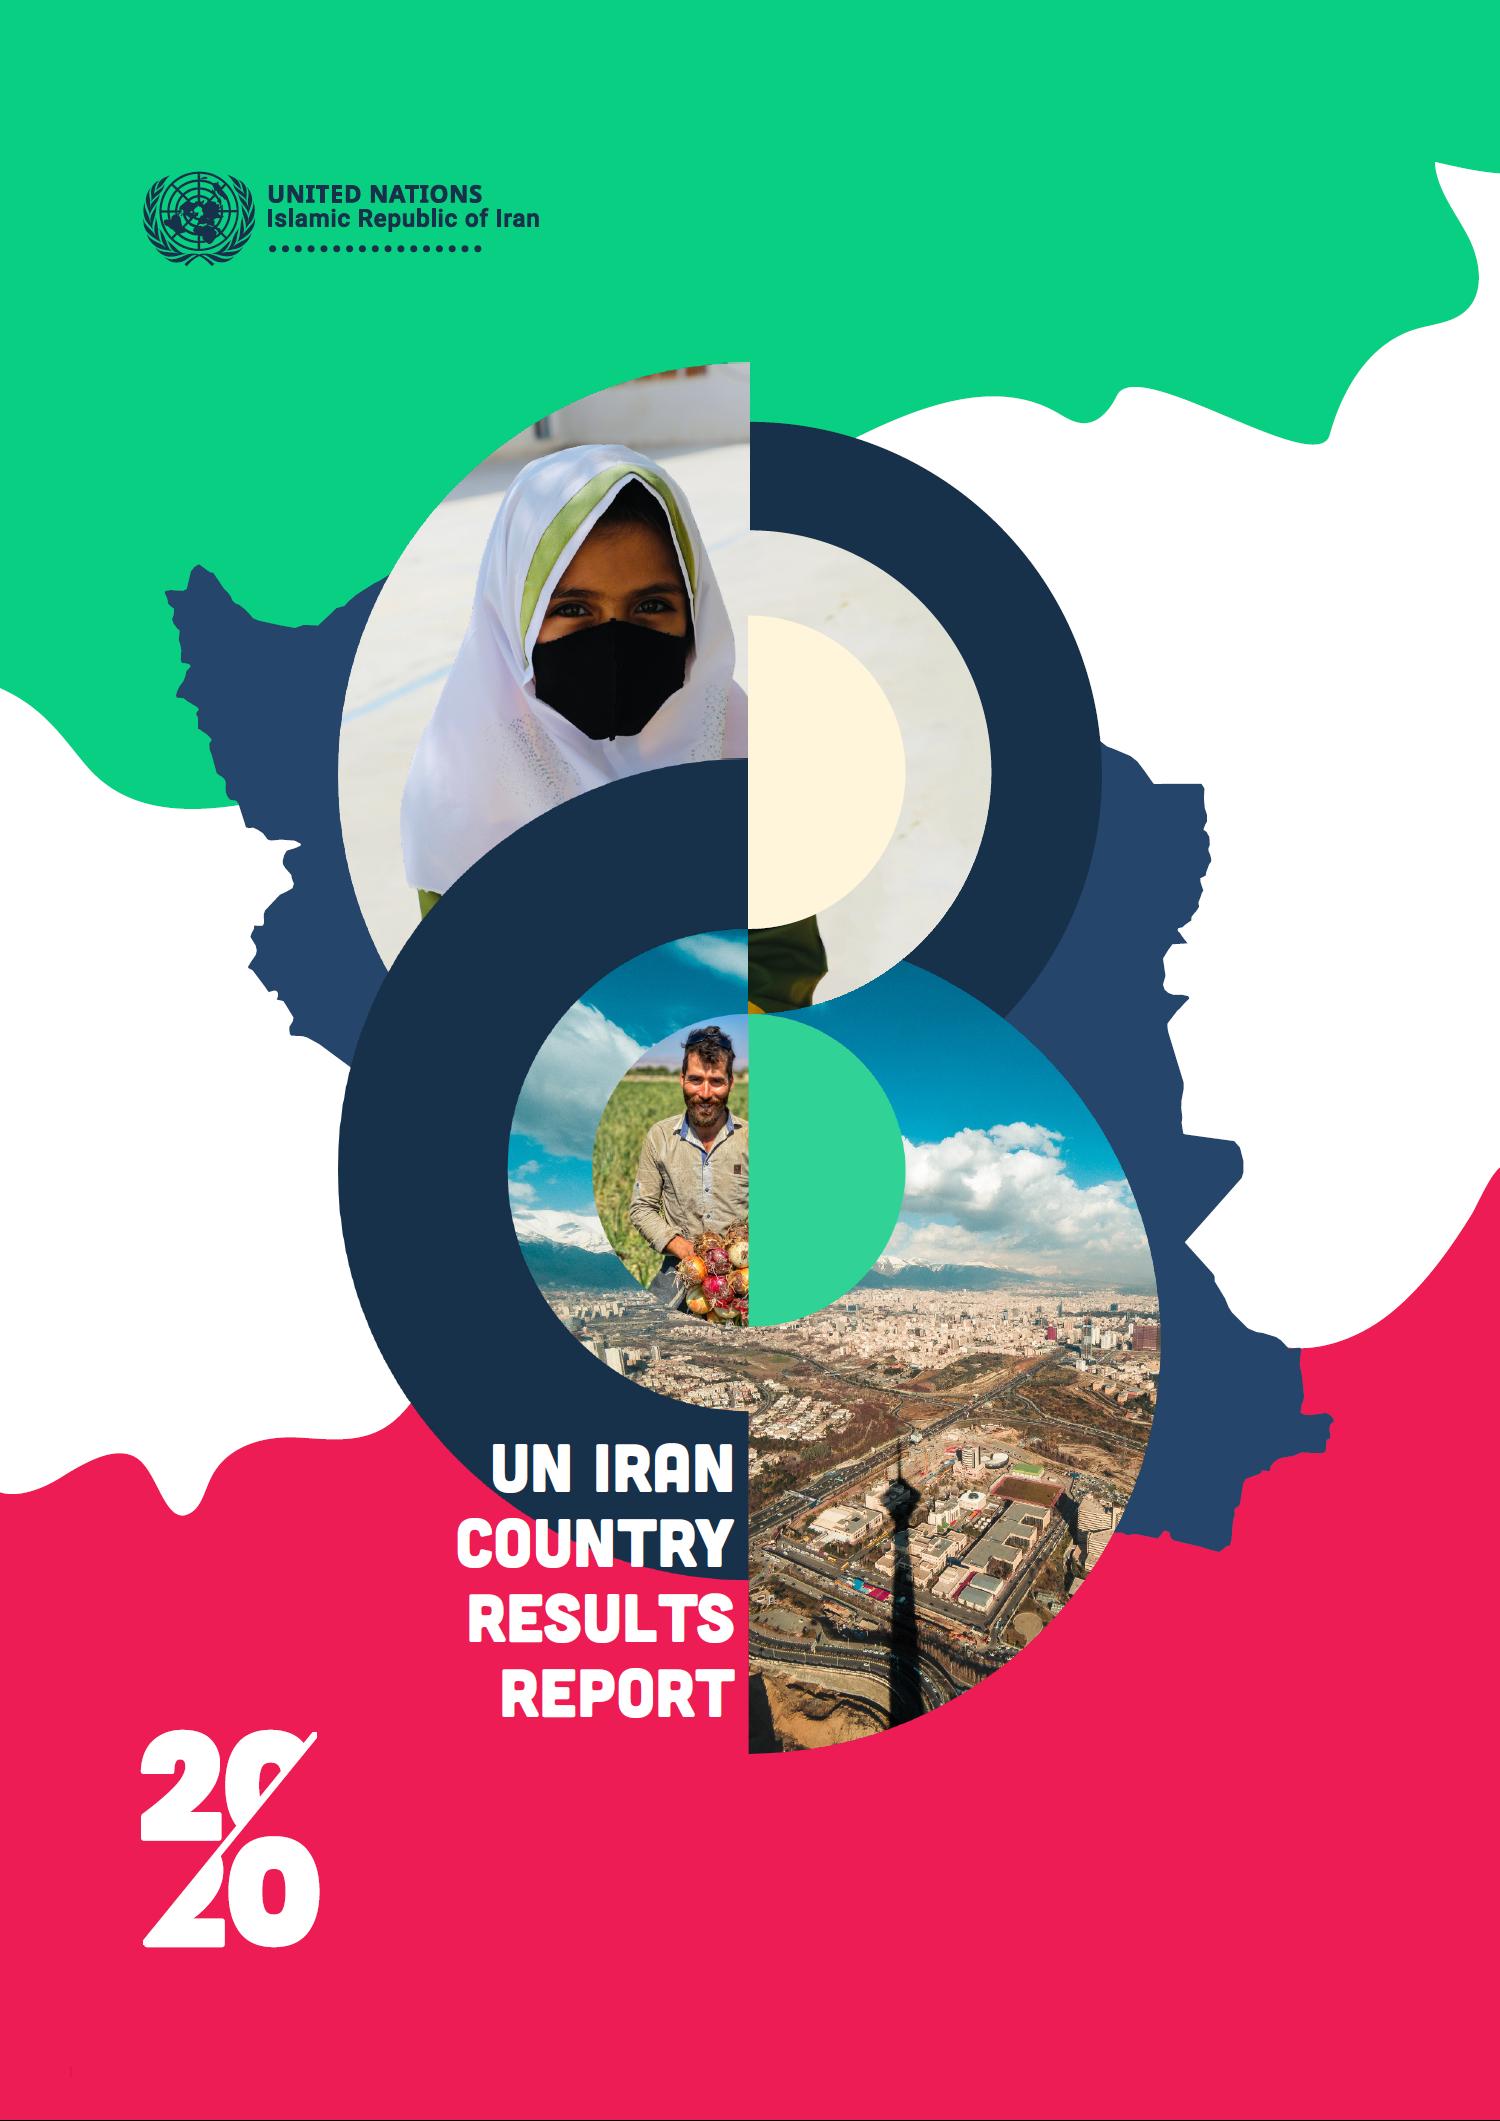 UN Iran Country Results Report 2020